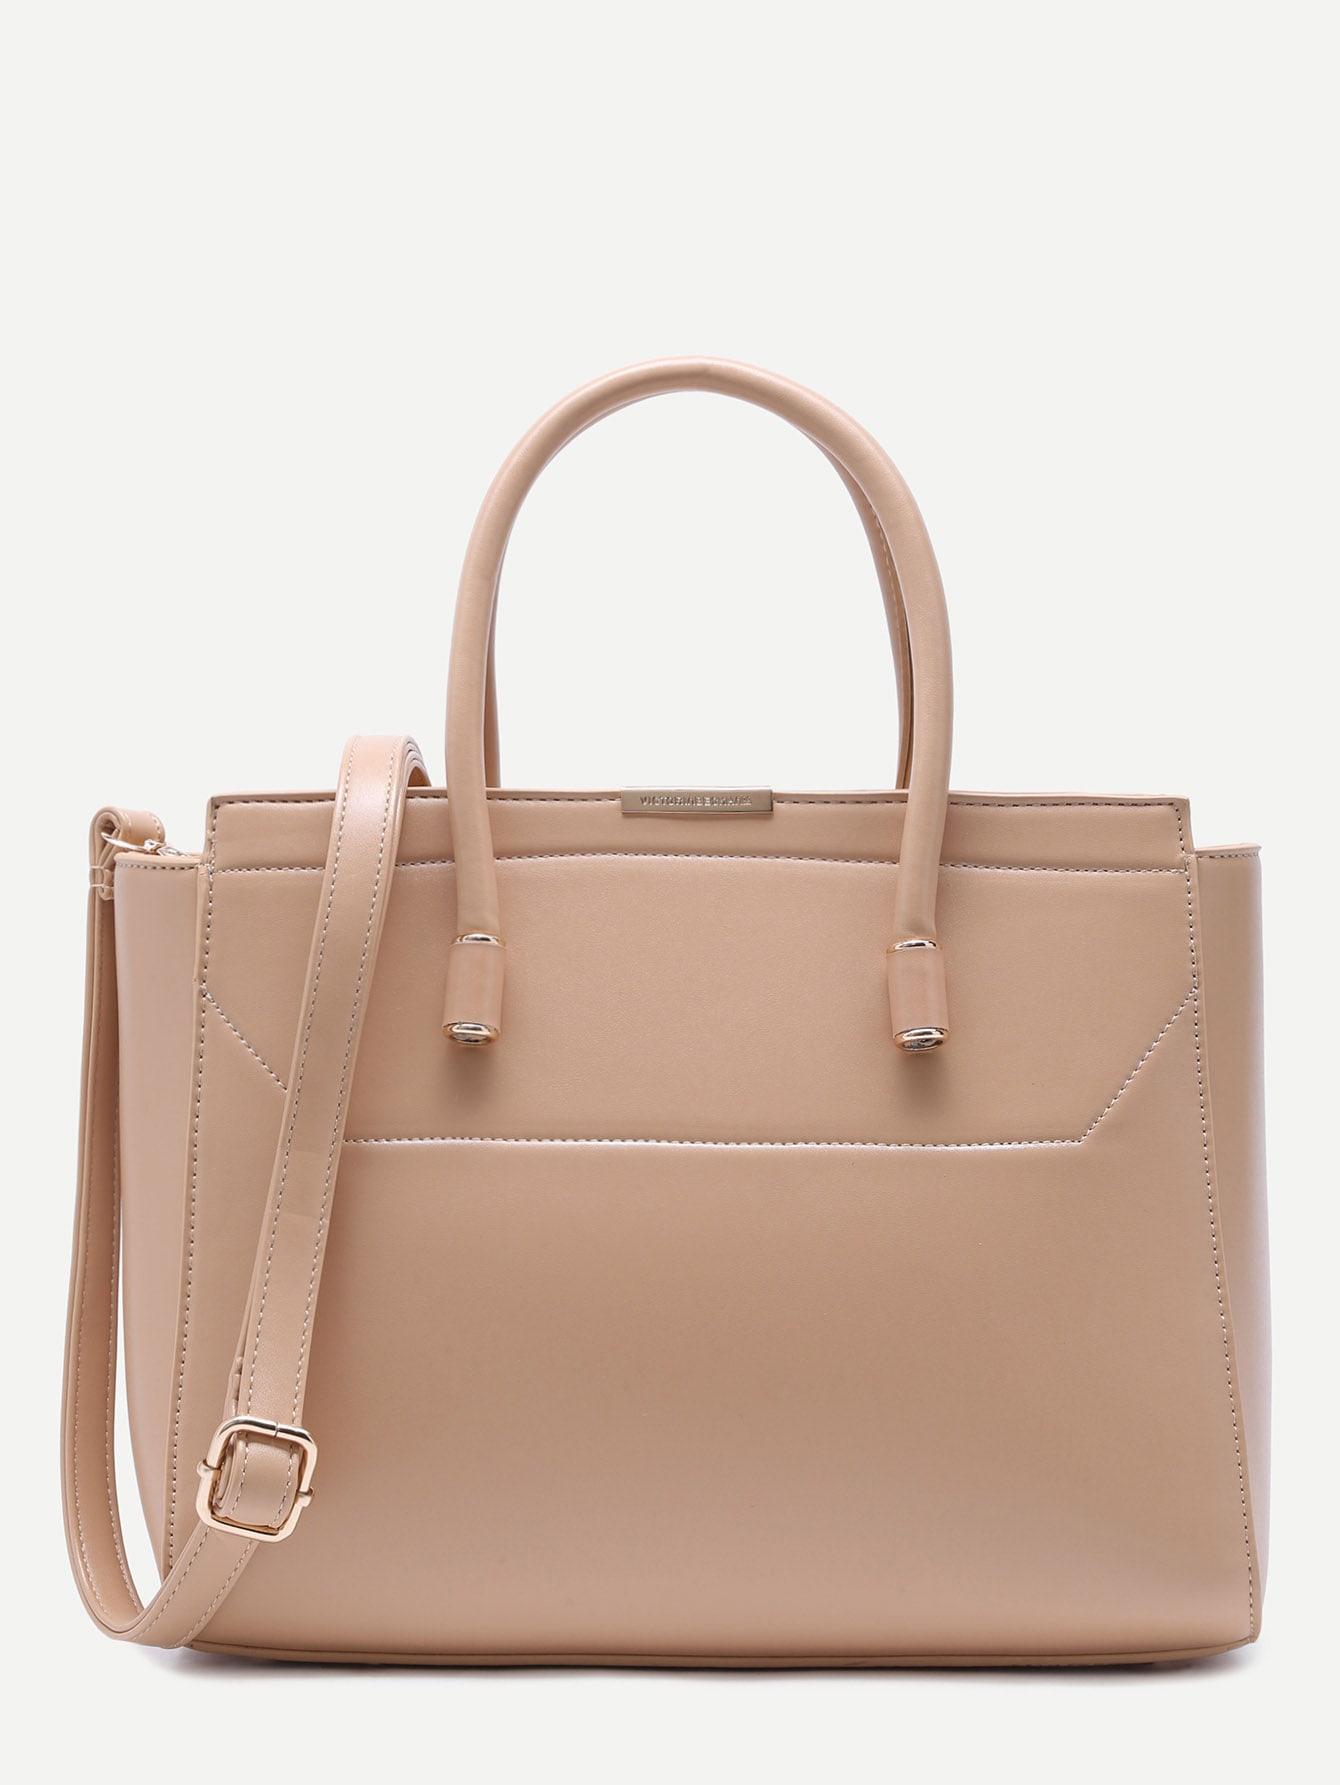 bag161018901_2